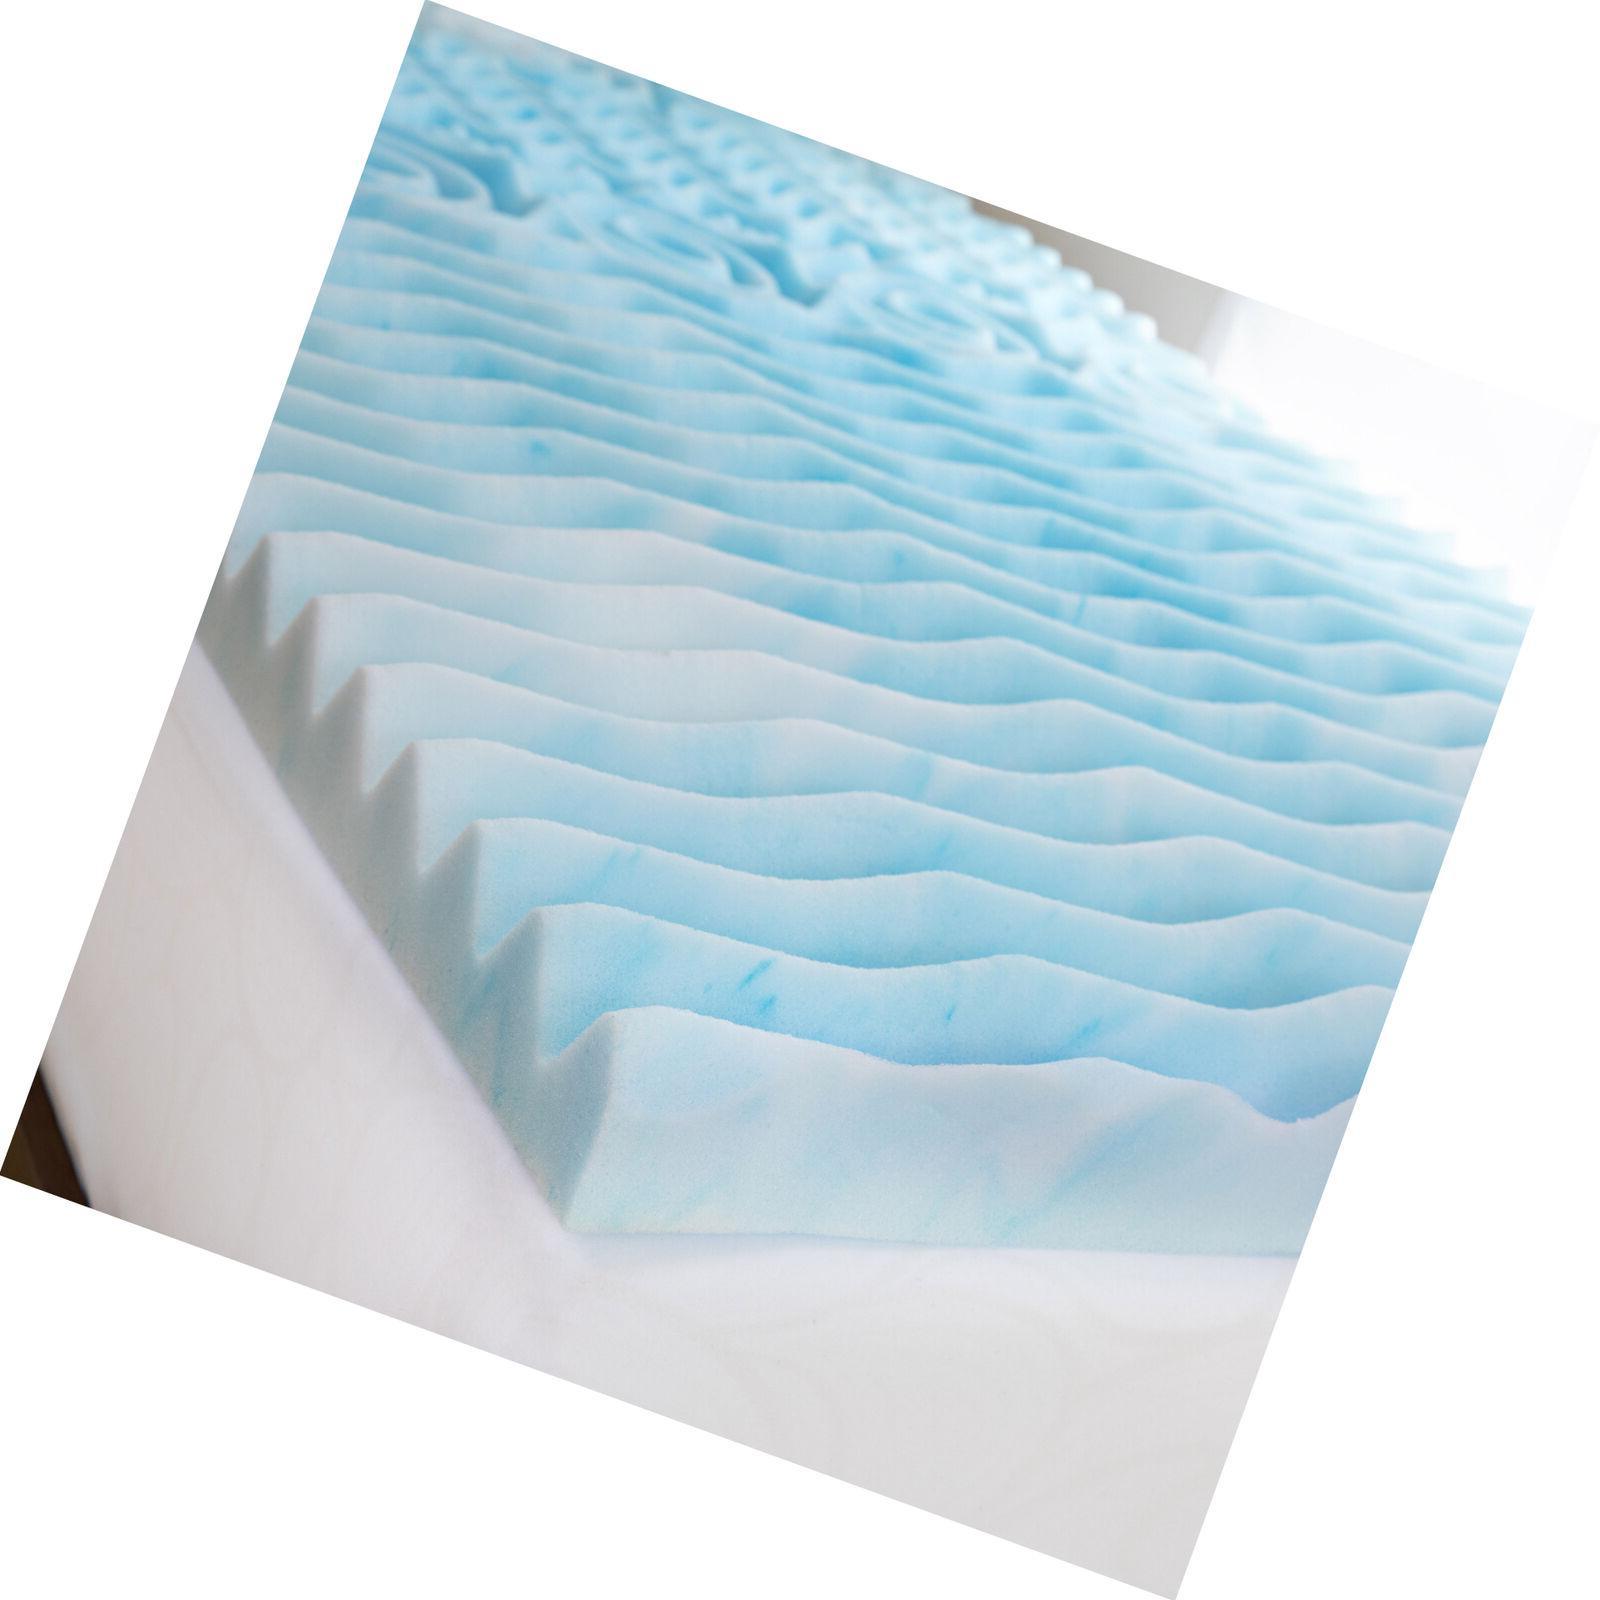 2 Inch Foam King Full Pad